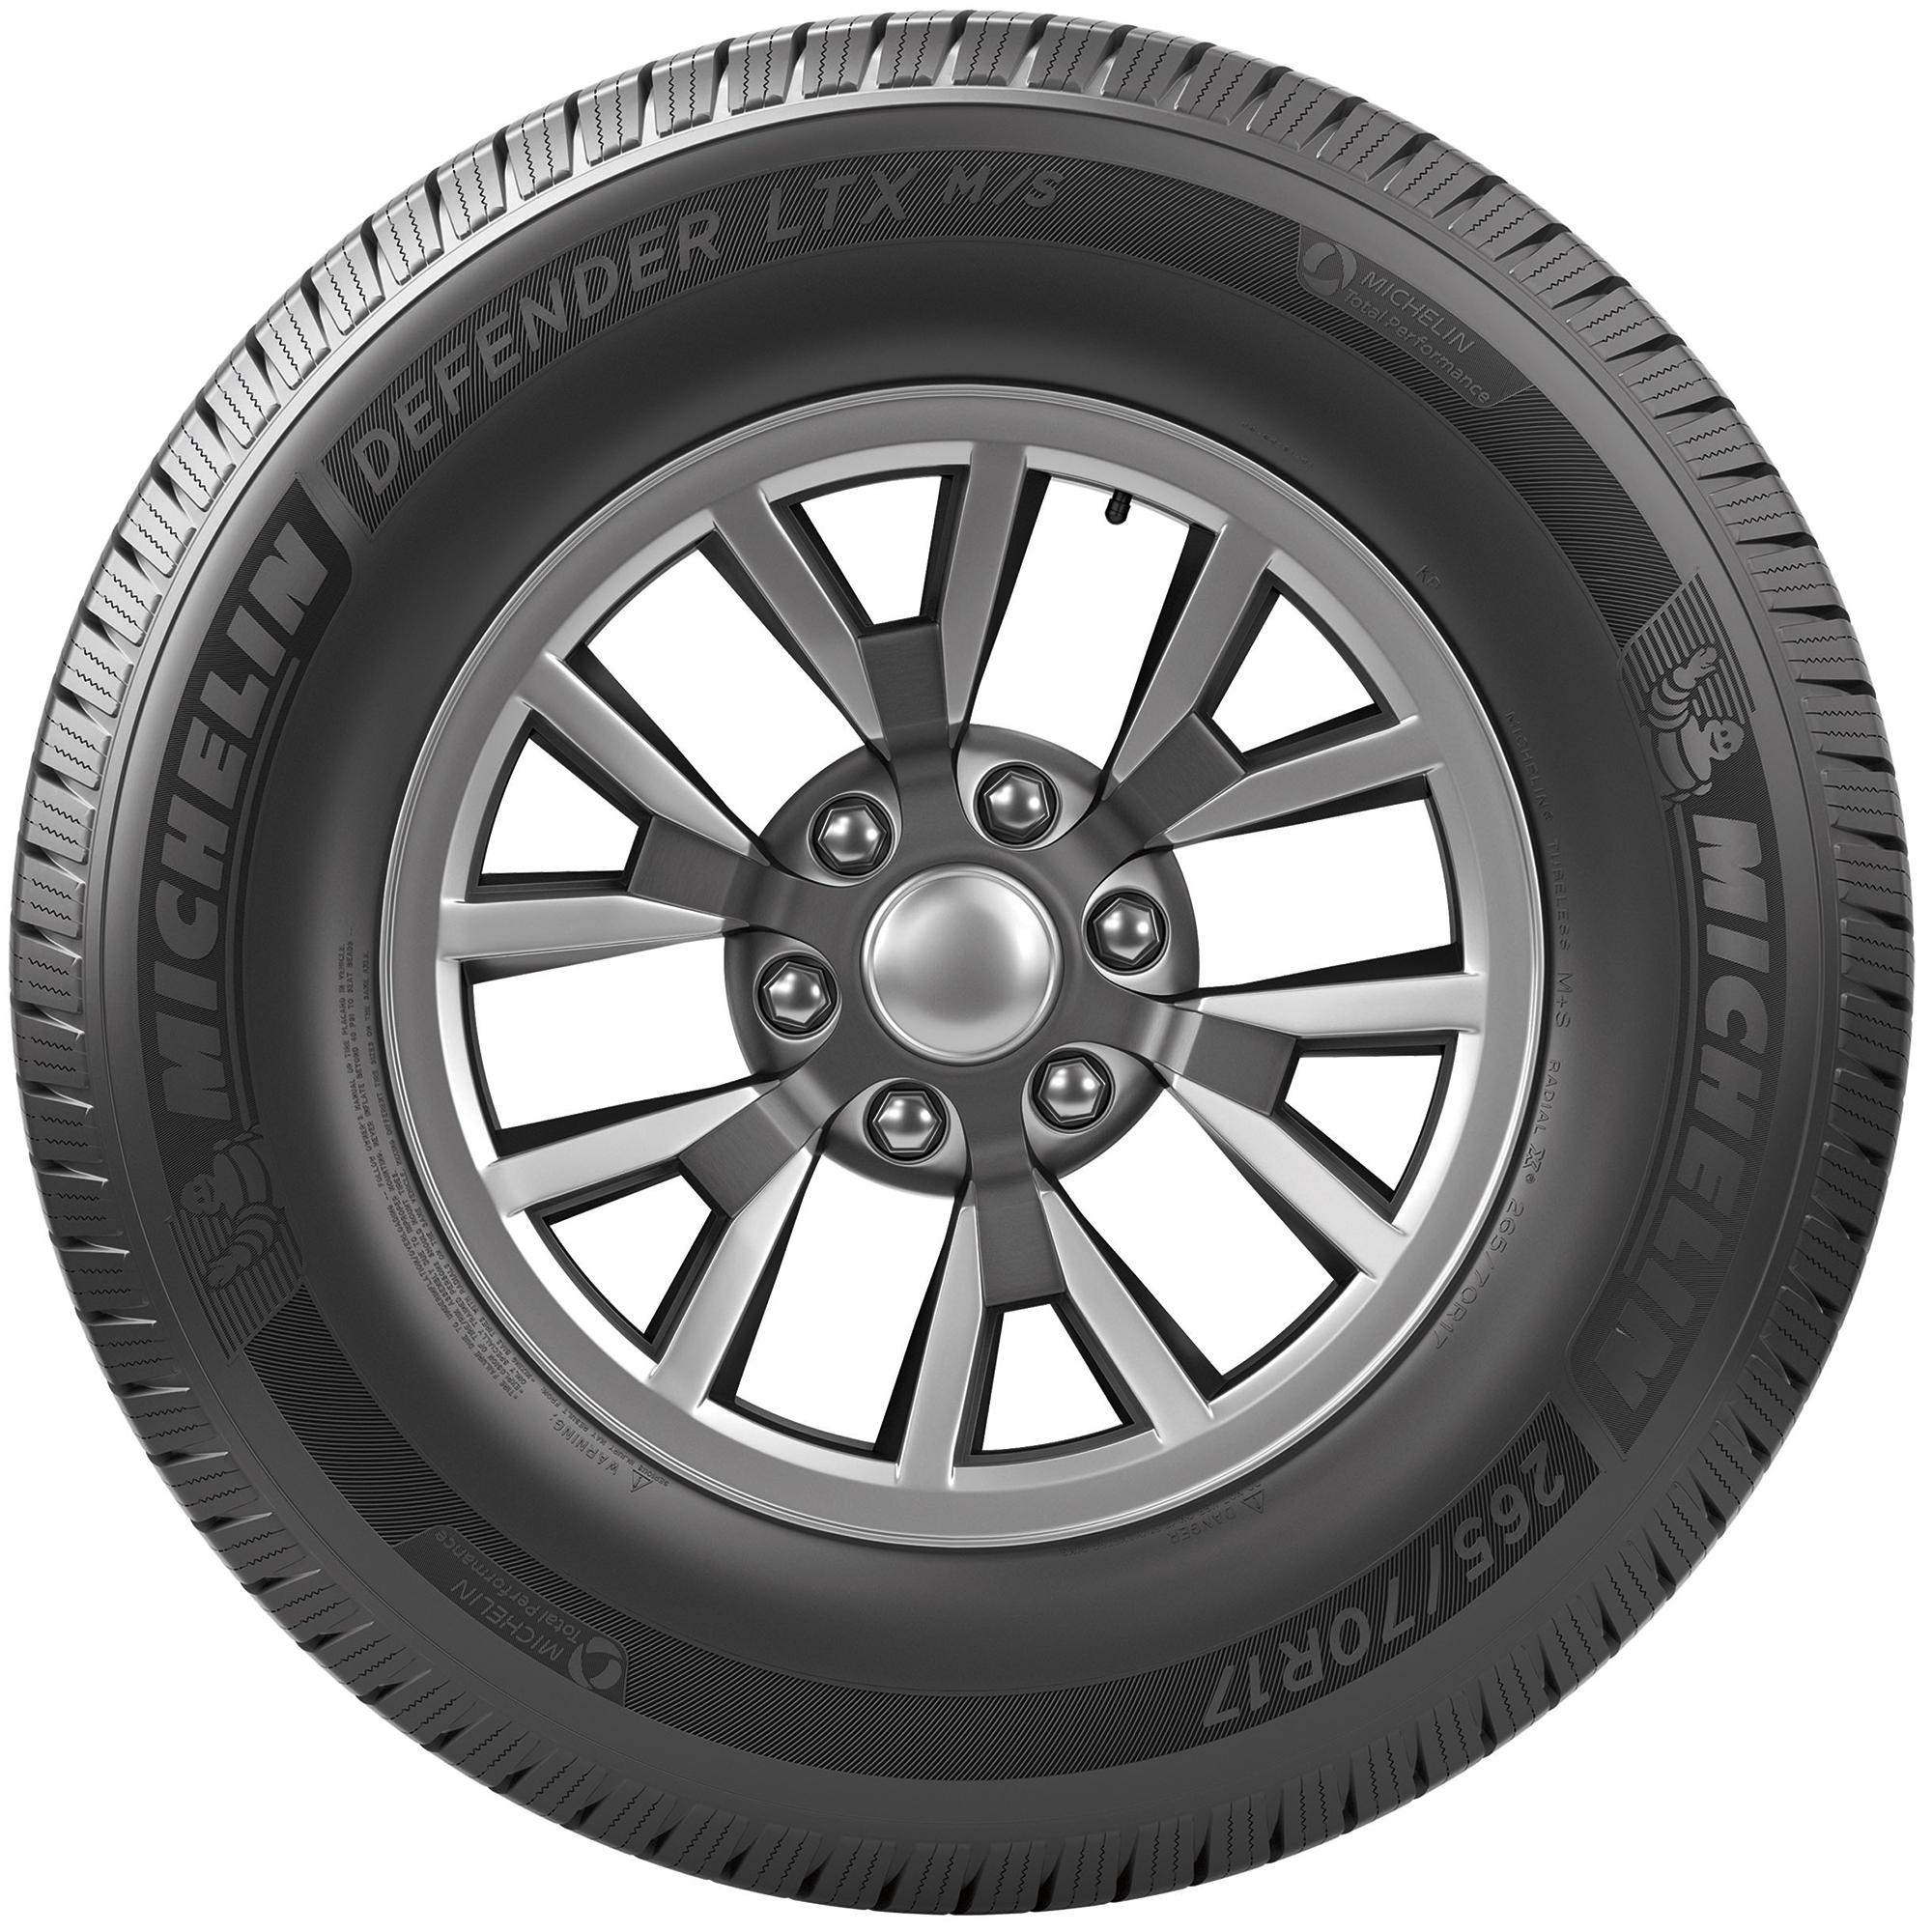 Michelin Defender LTX M/S Highway Tire LT275/65R18/E 123/120R